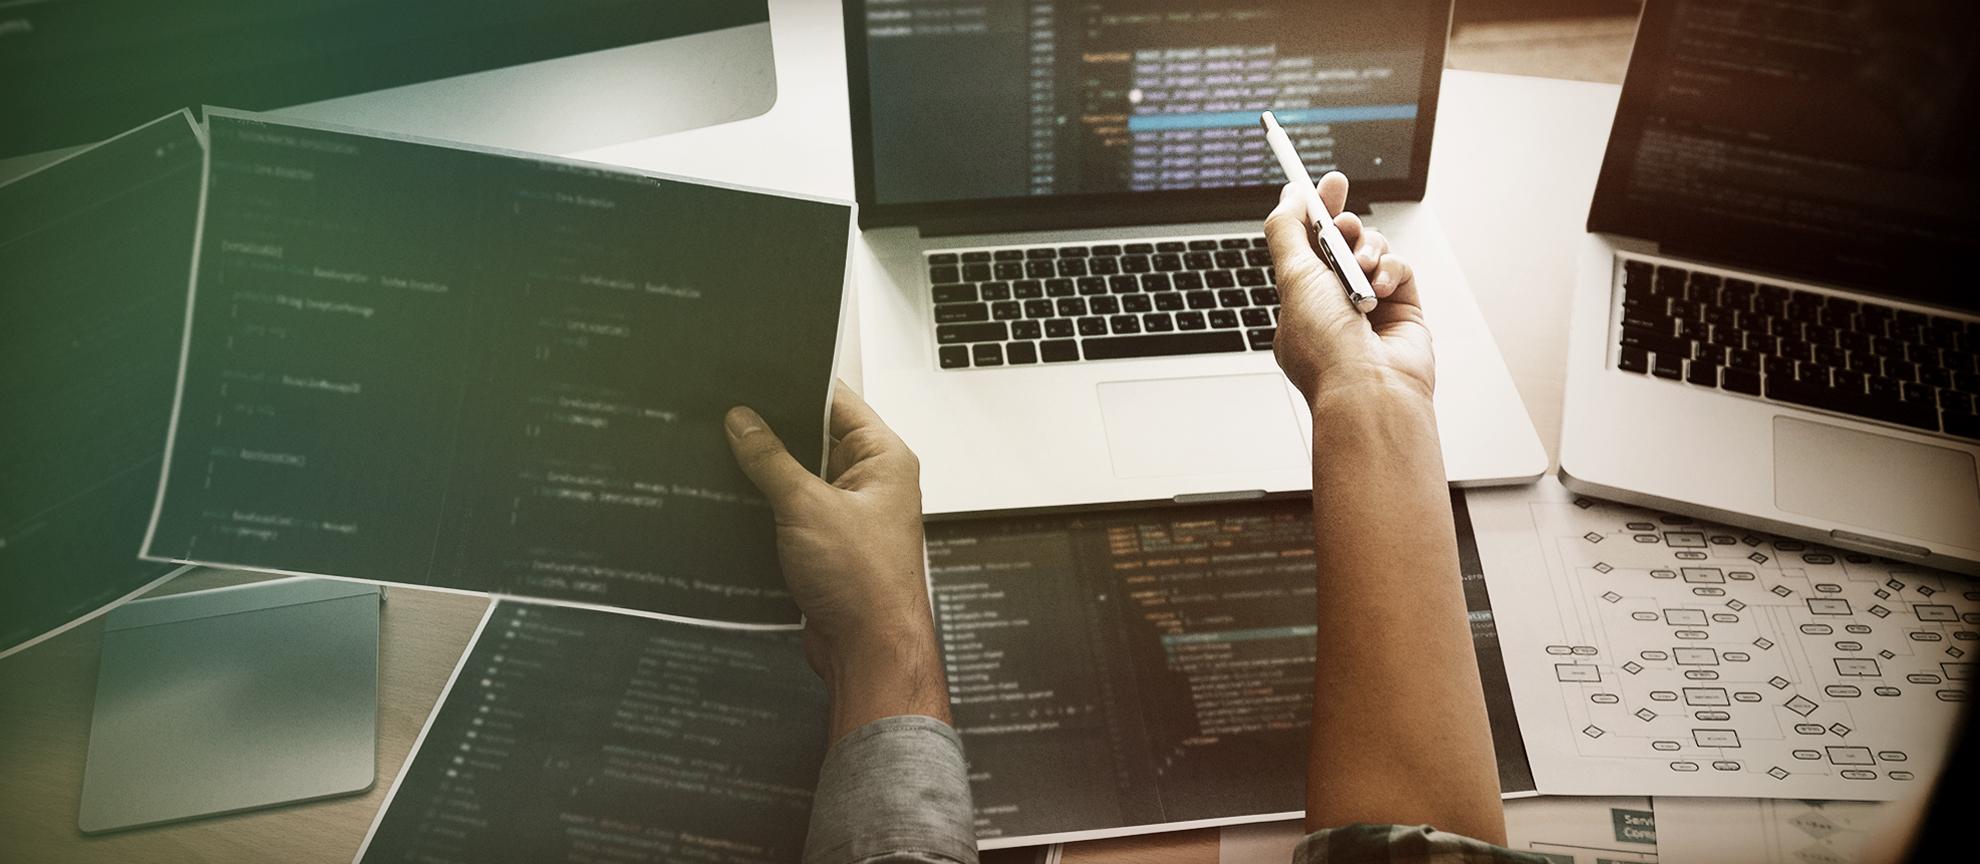 FileMakerの開発